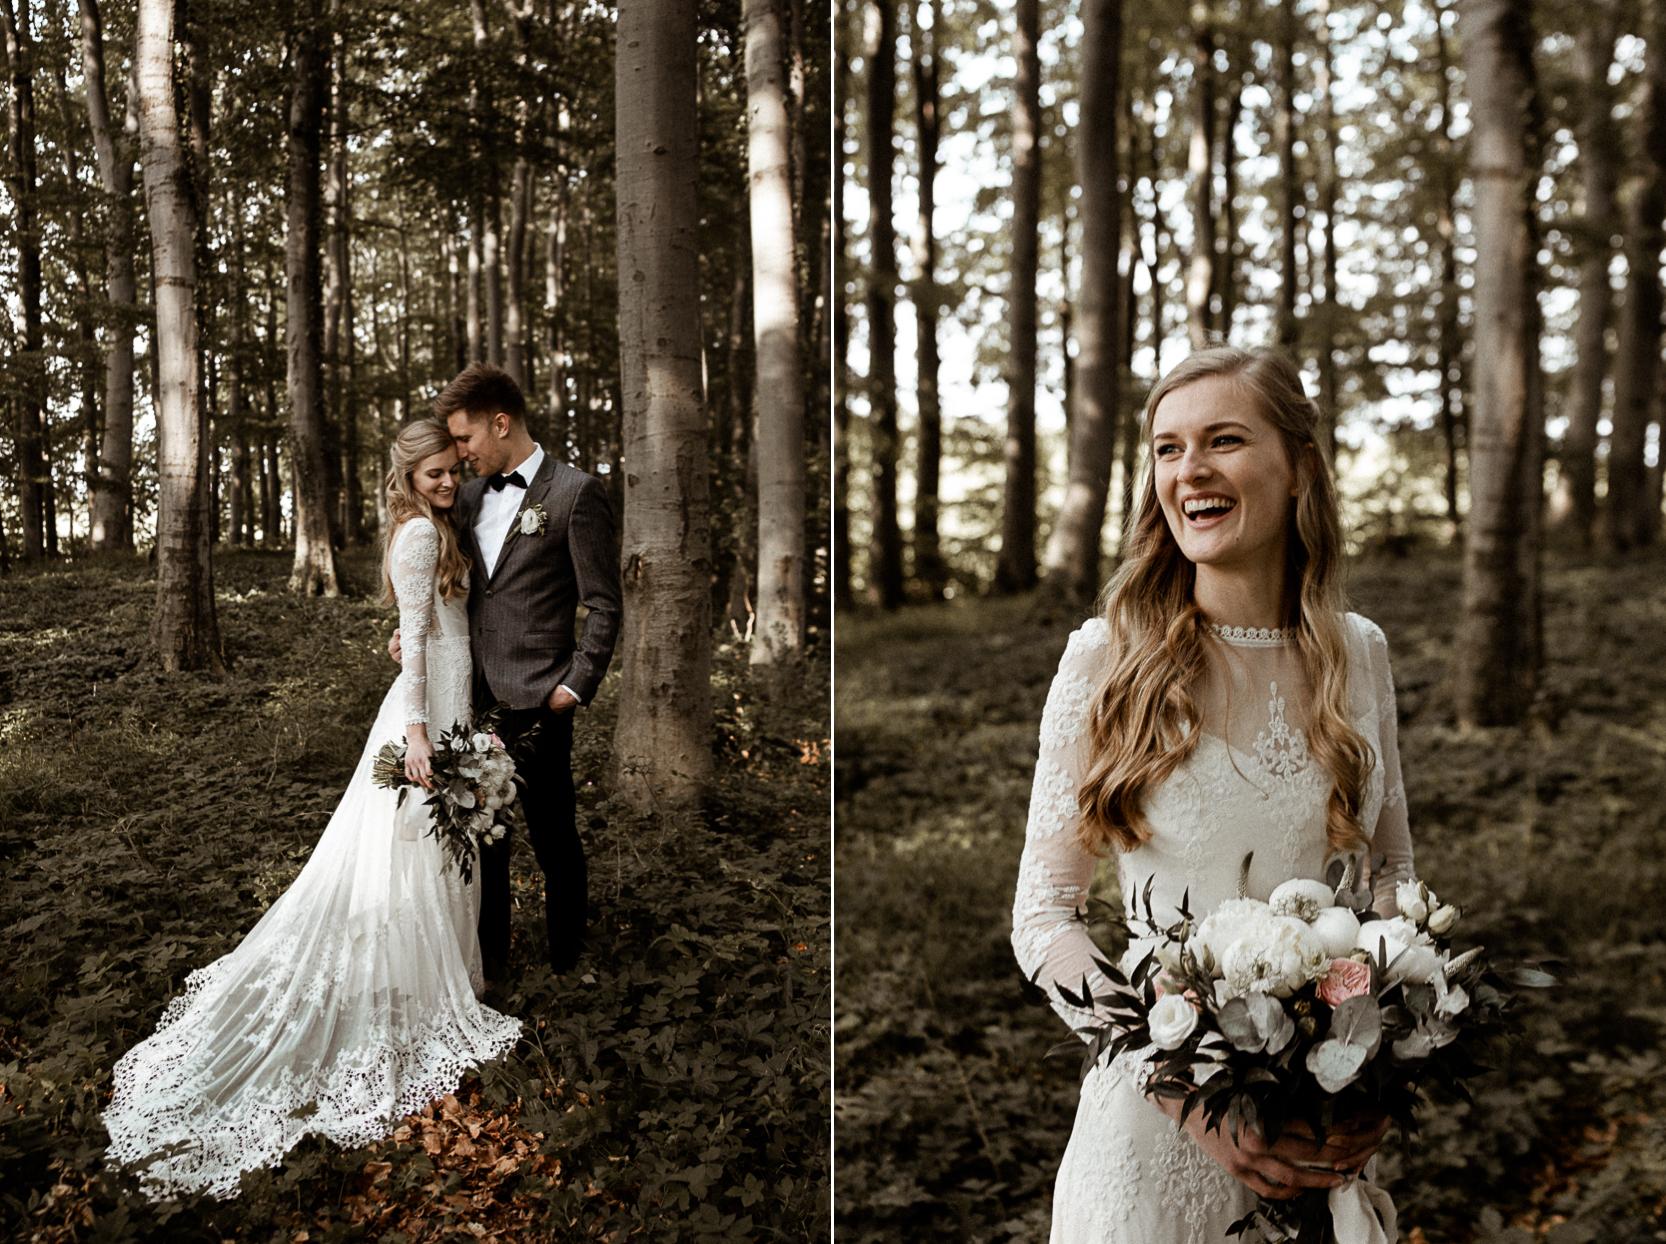 wholeheartedweddings-Timo-Matthies-Sean&Judy-boho-Barnweddings-1-2_hoch_8.jpg